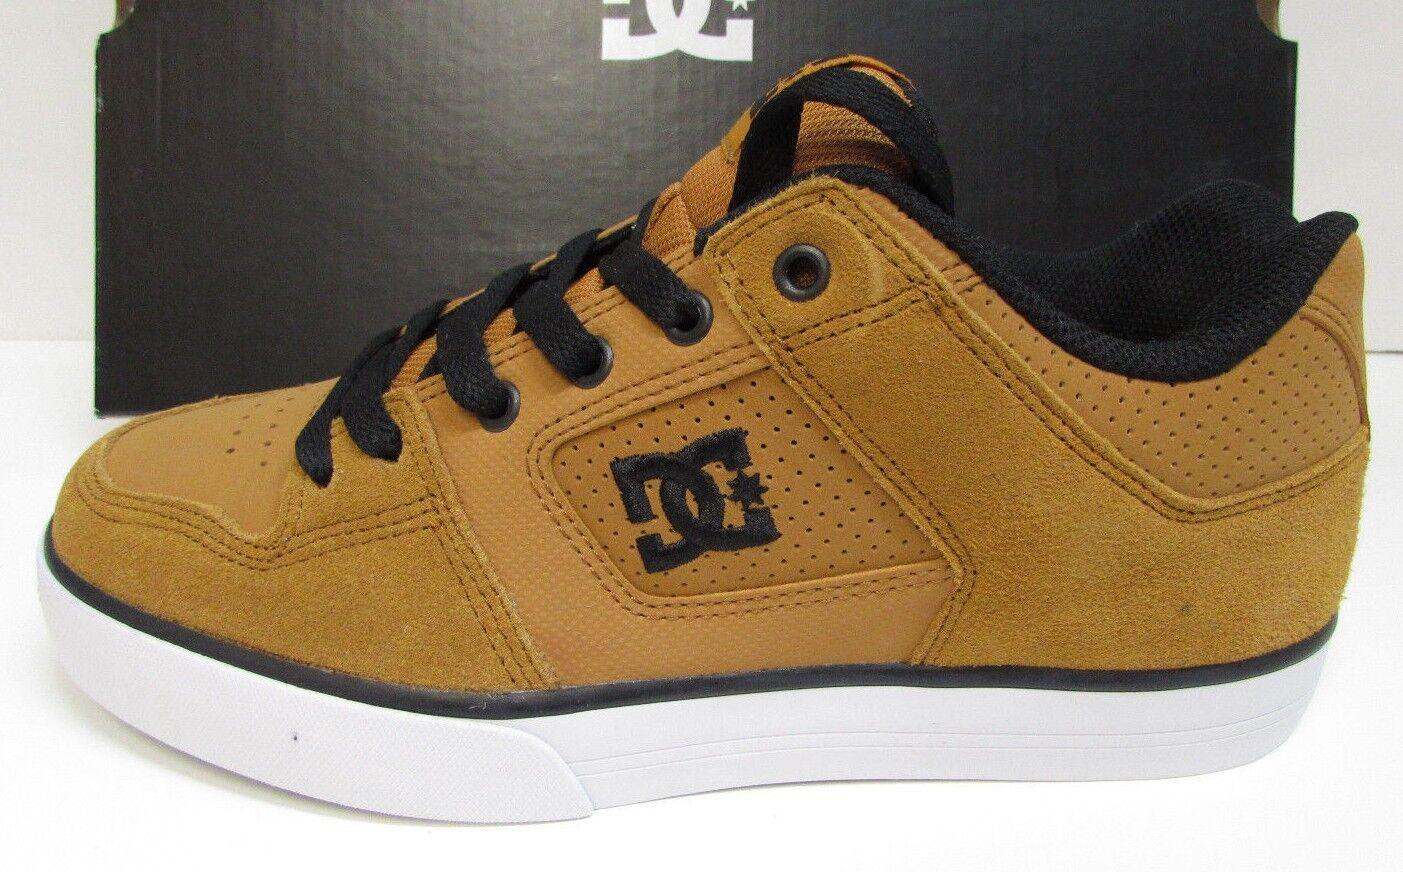 DC SkateBoard Größe 7 Leather Turnschuhe New Mens schuhe